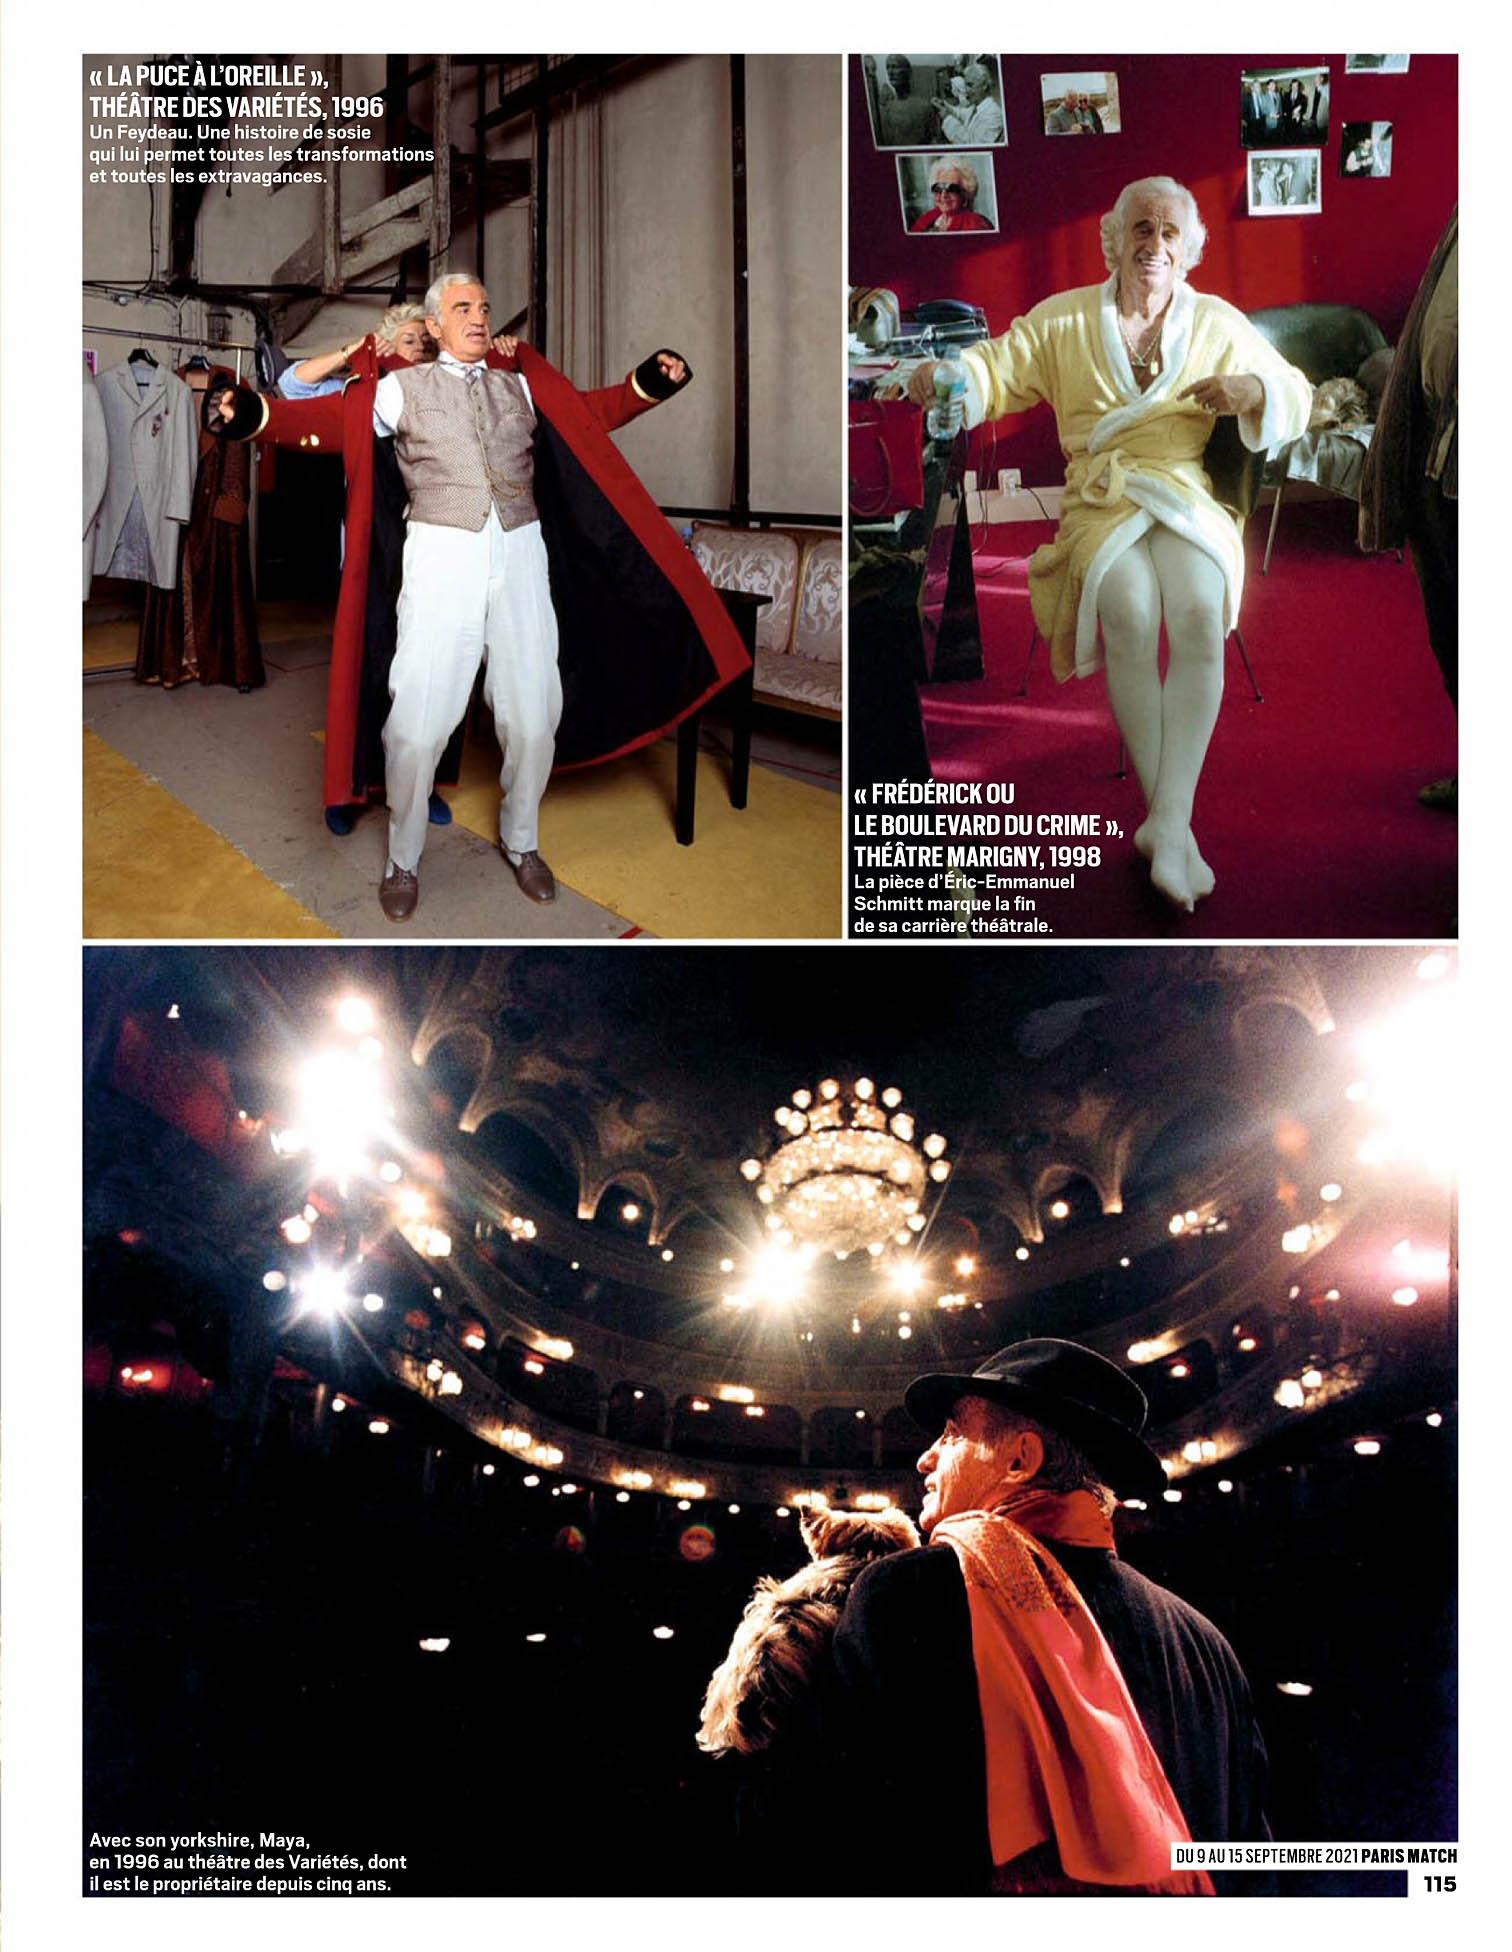 Paris Match 210909 Belmondo 42.jpg